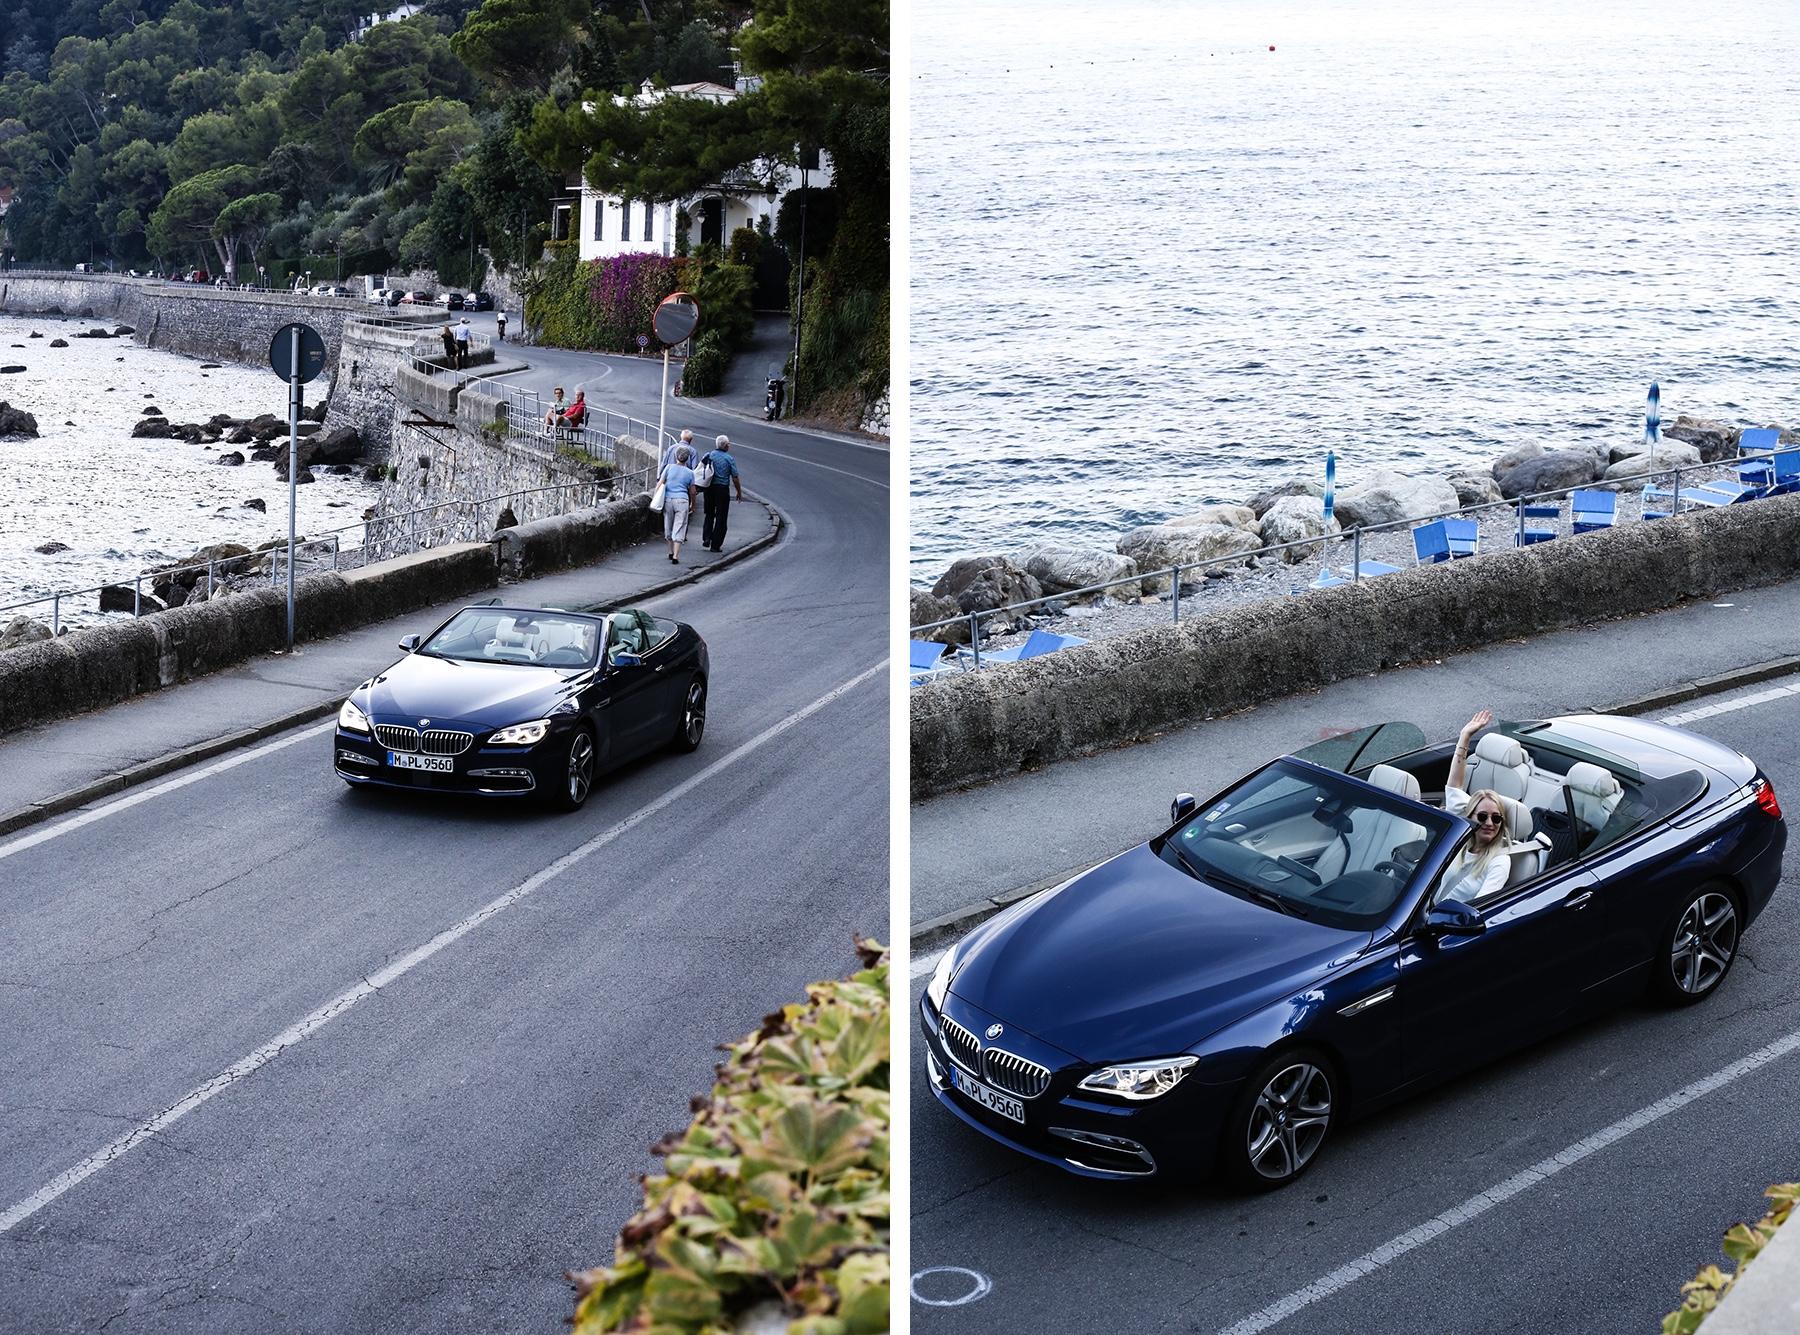 style-shiver-travel-ligurien-italien-24